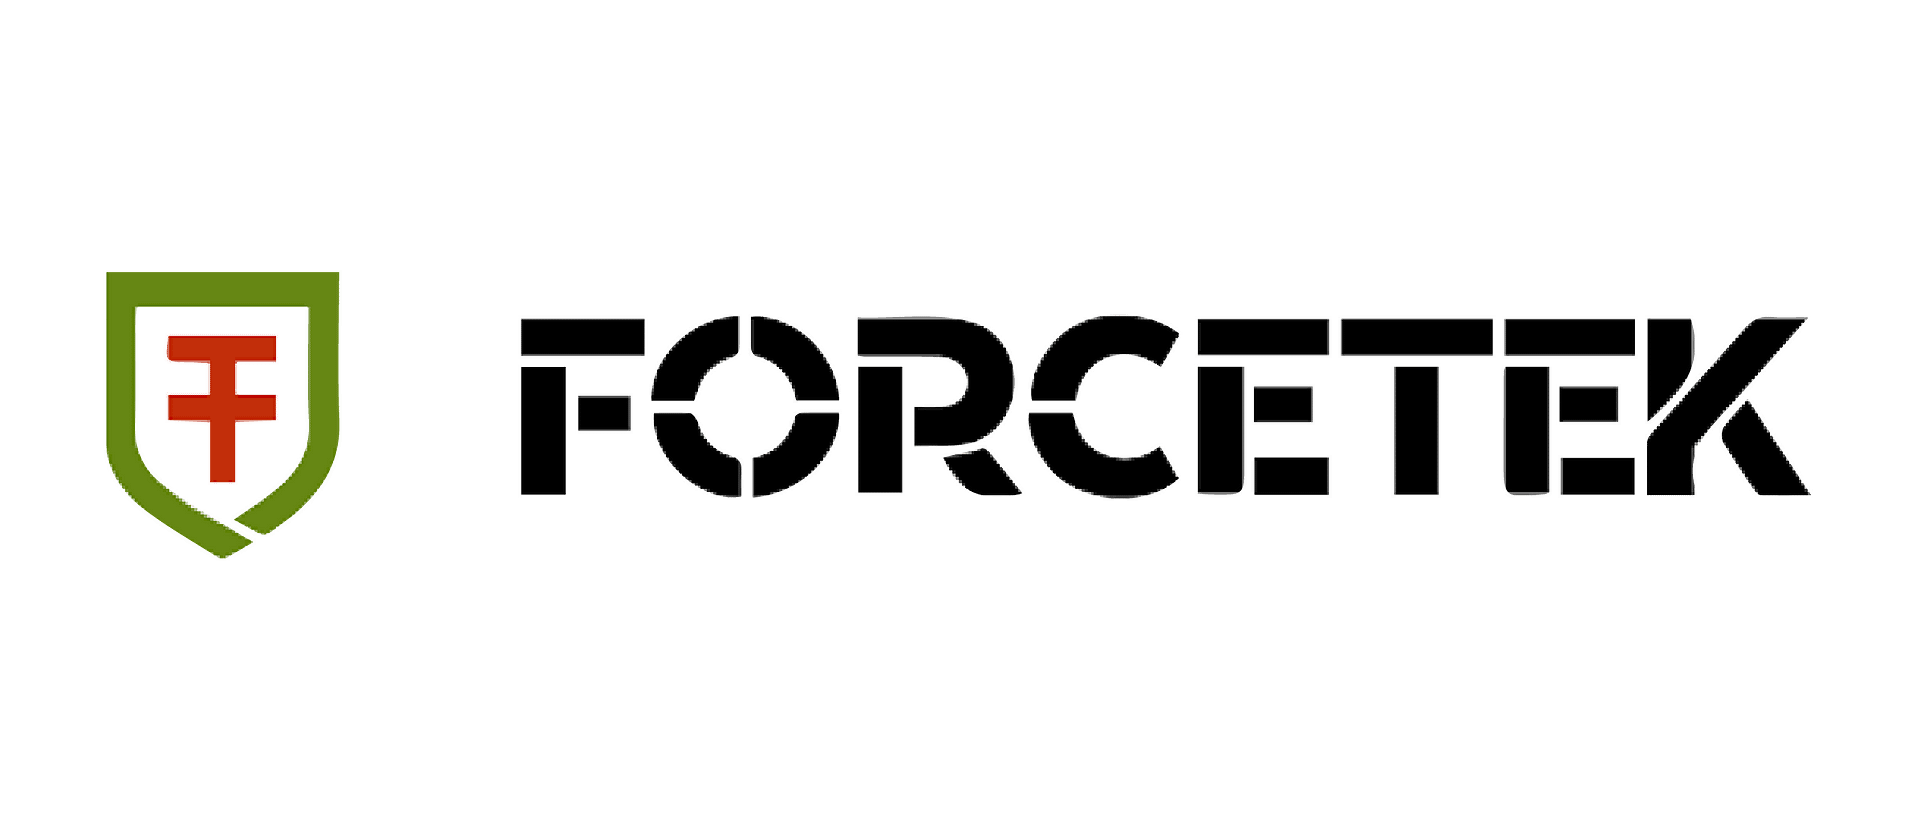 Forcetek